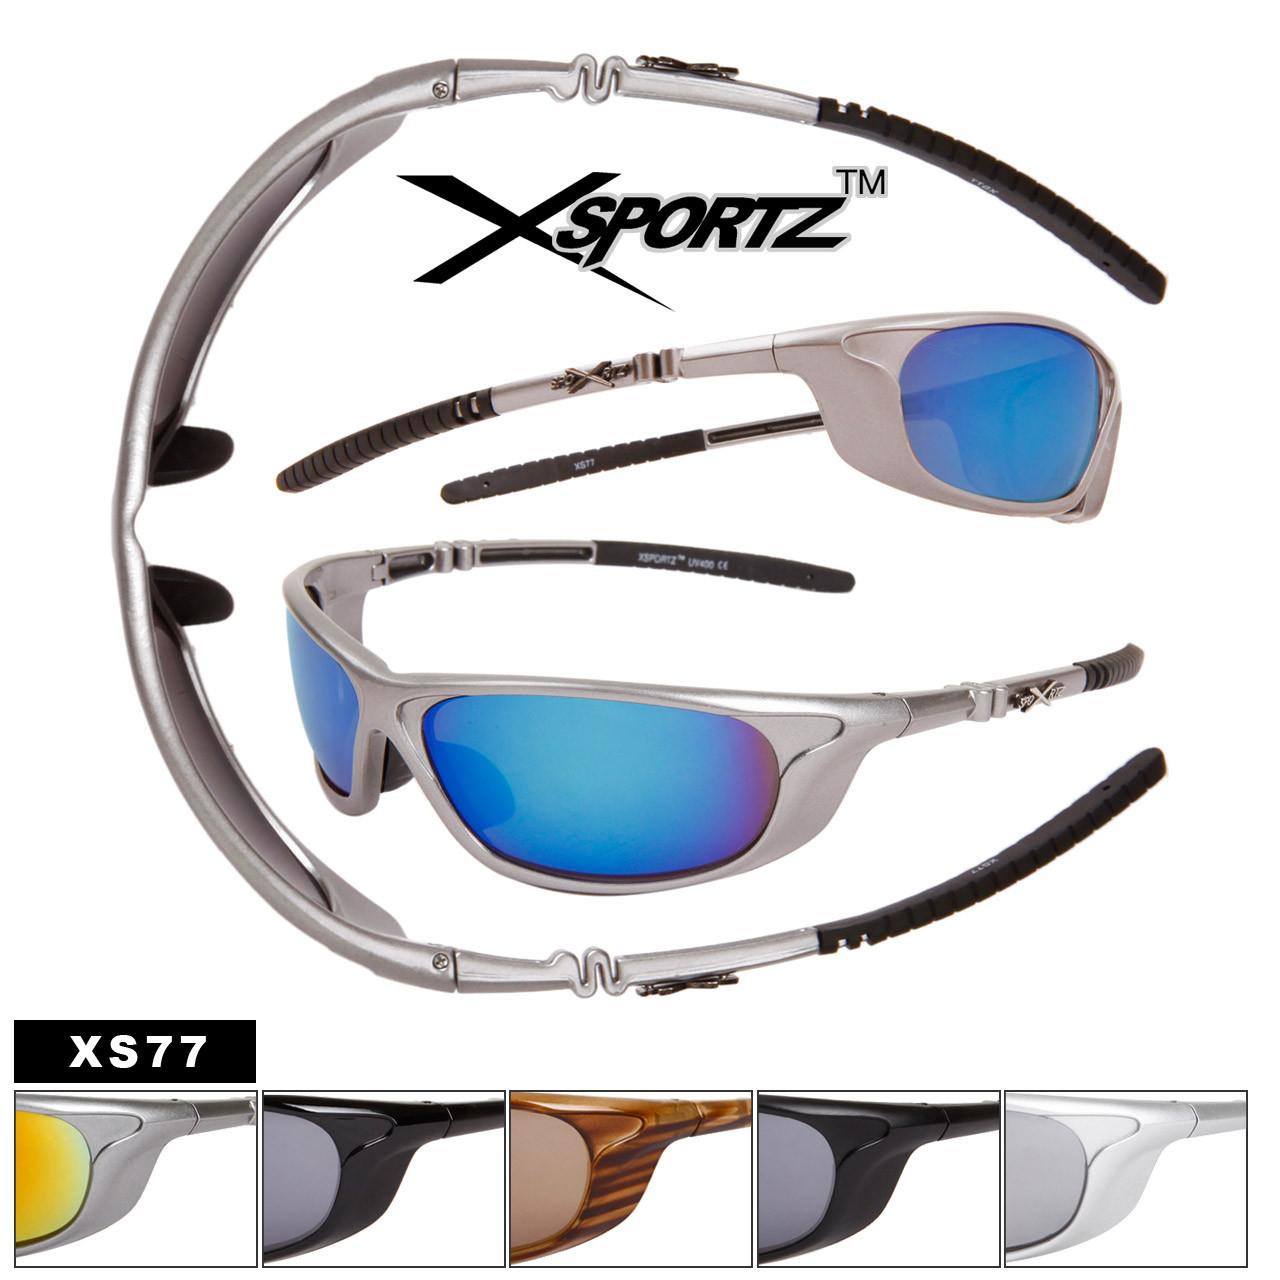 Wholesale Sports Sunglasses by Xsportz XS77